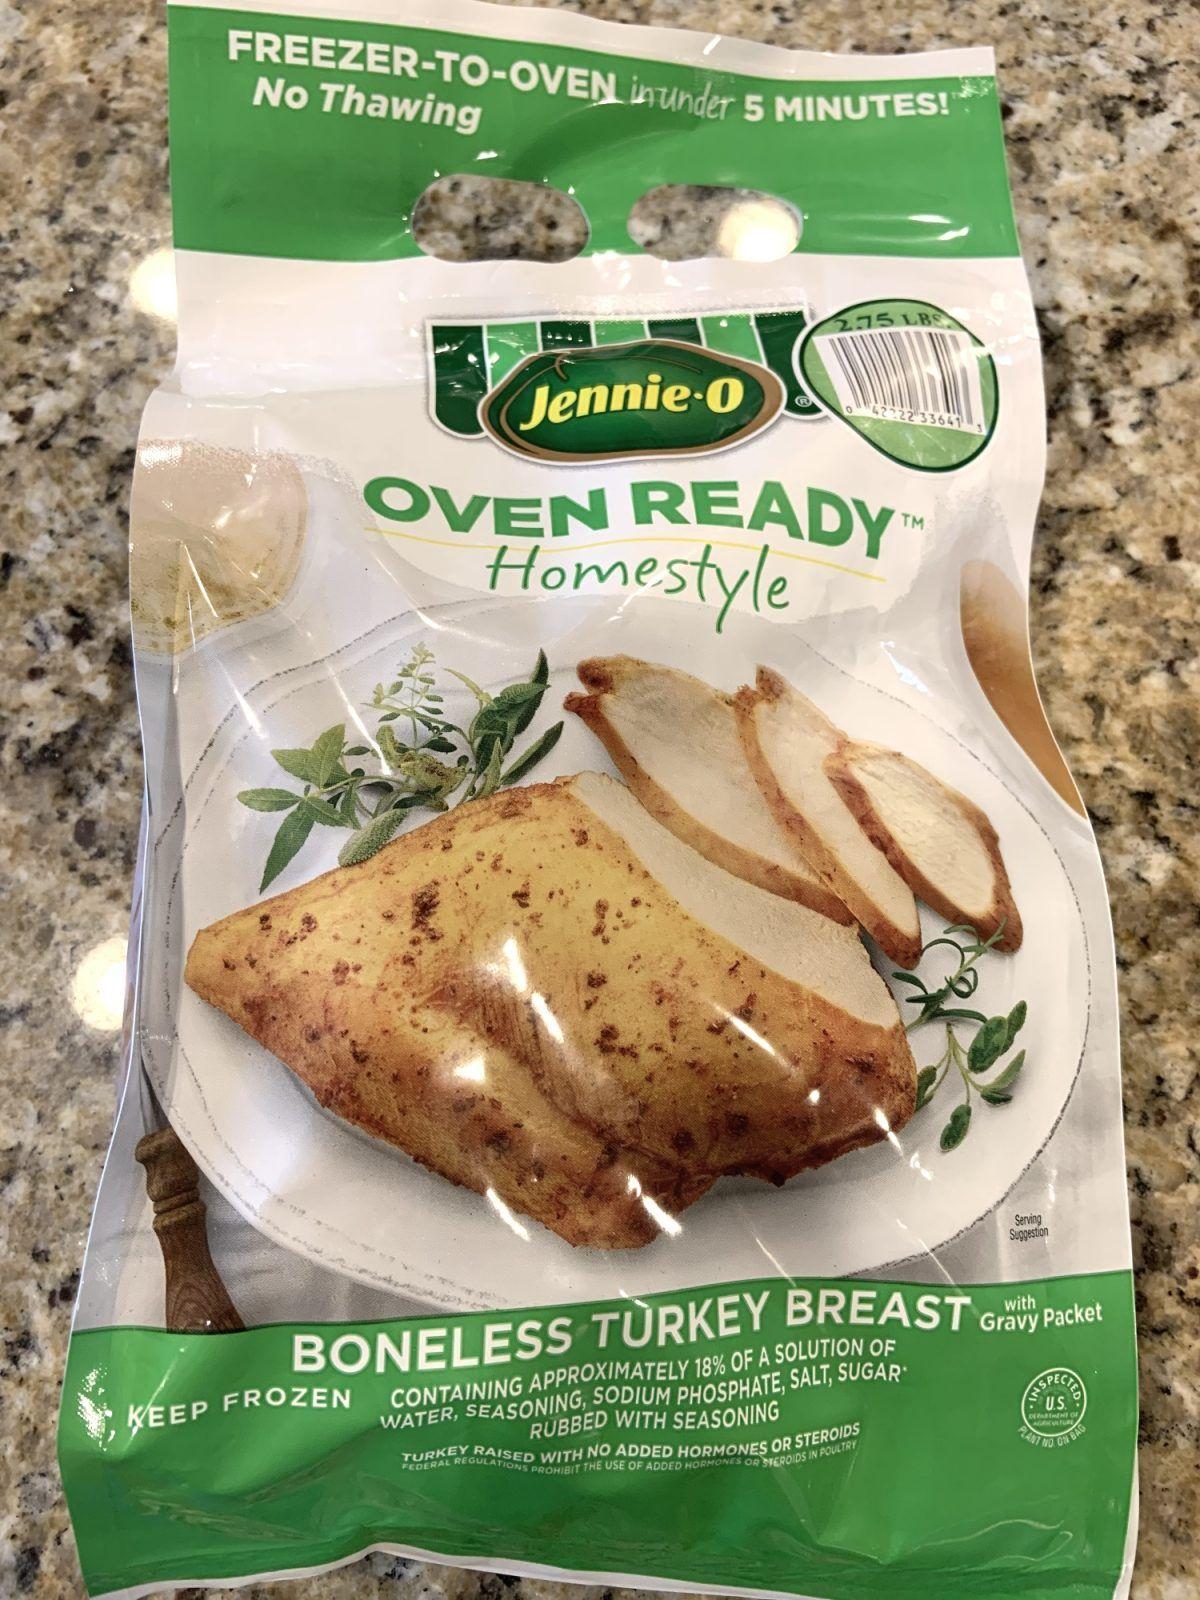 17 air fryer rotisserie turkey breast recipes ideas